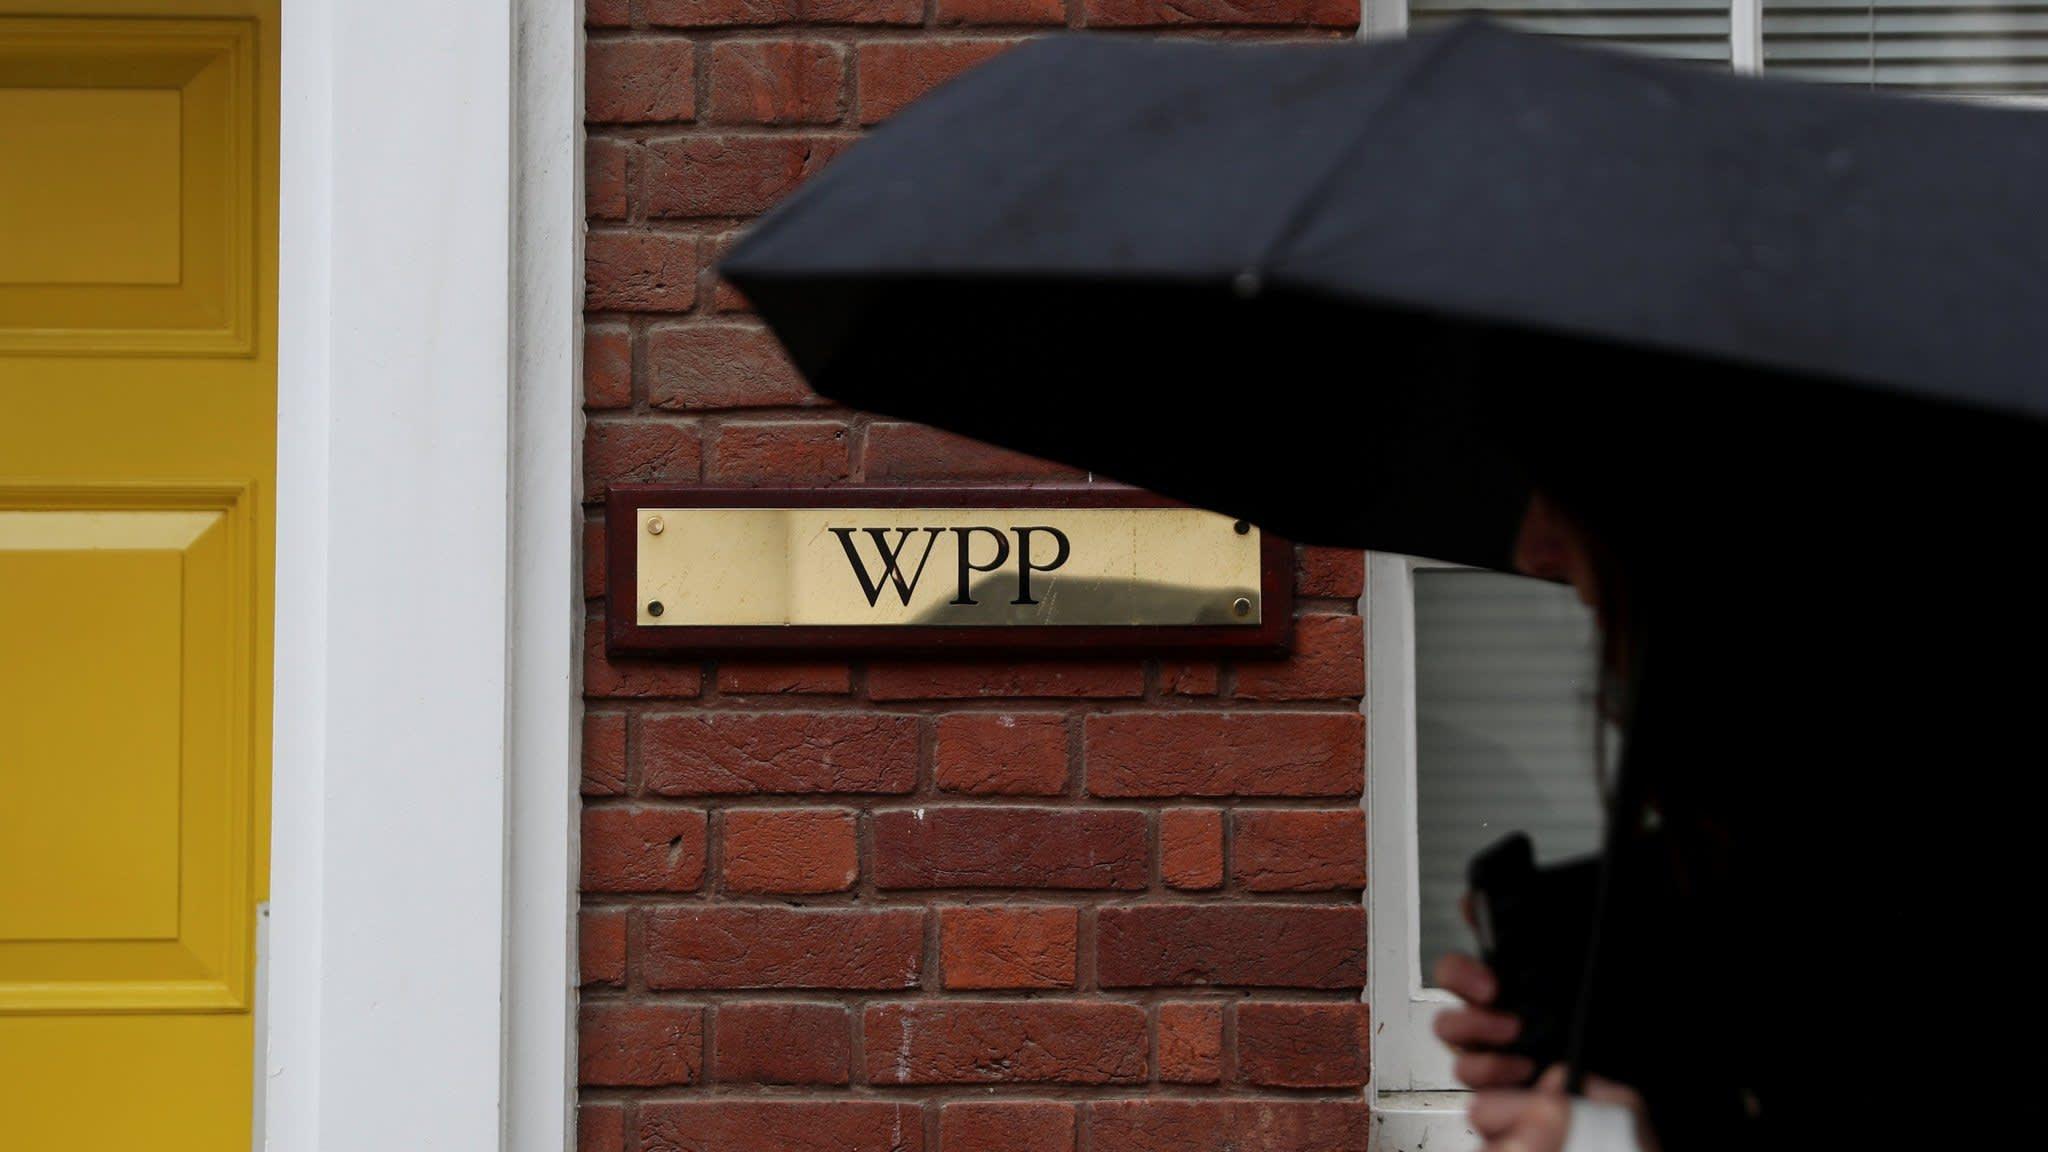 WPP to merge J Walter Thompson and Wunderman agencies